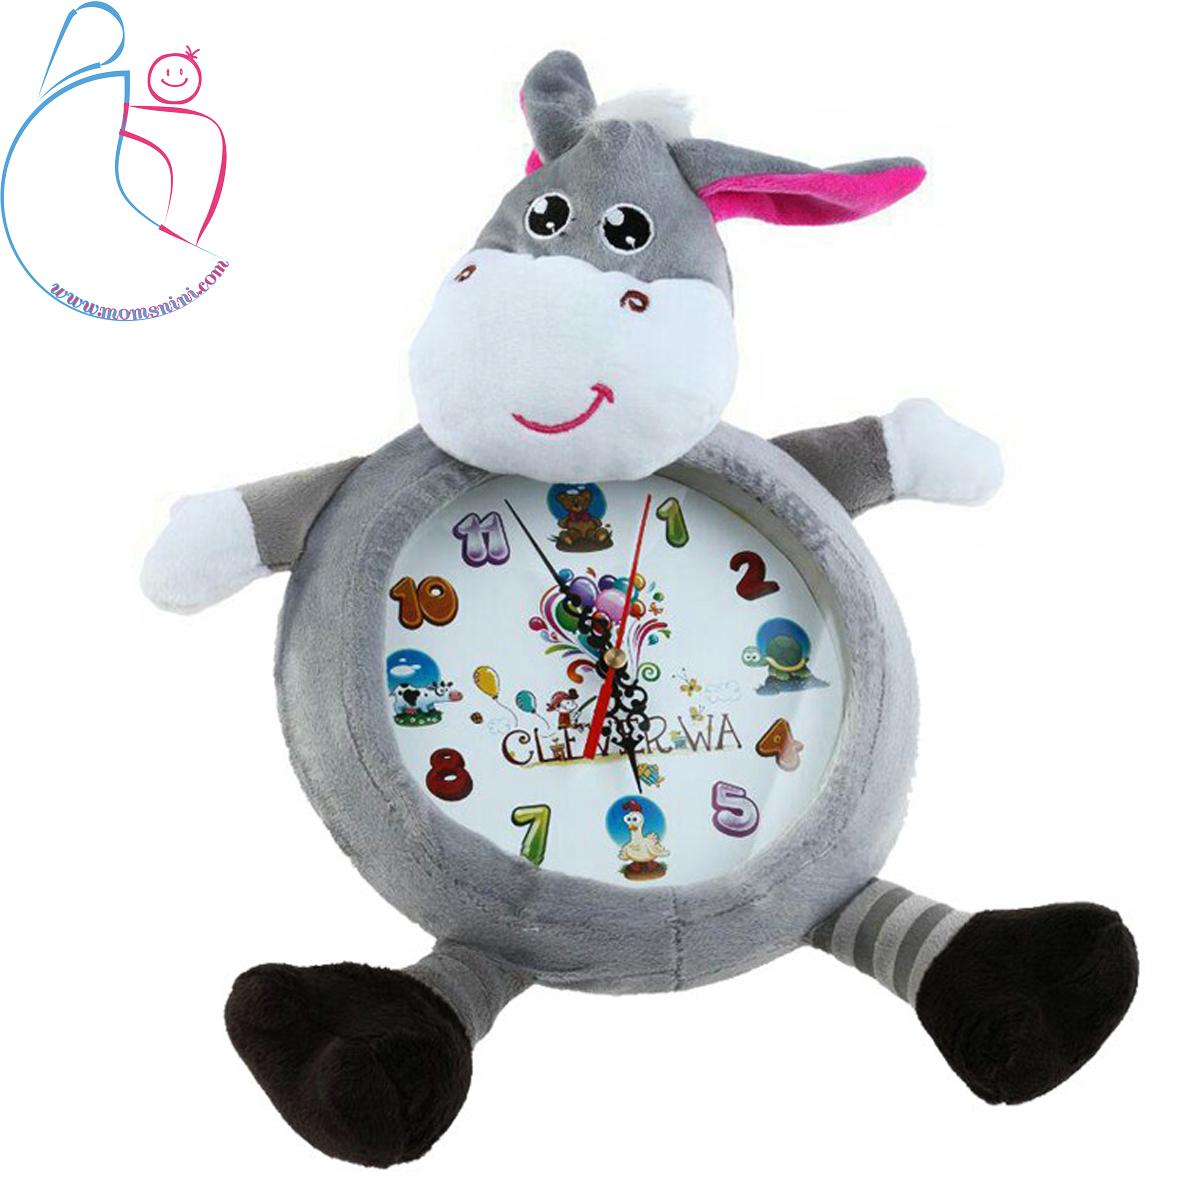 ساعت پولیشی اتاق کودک مدل الاغ